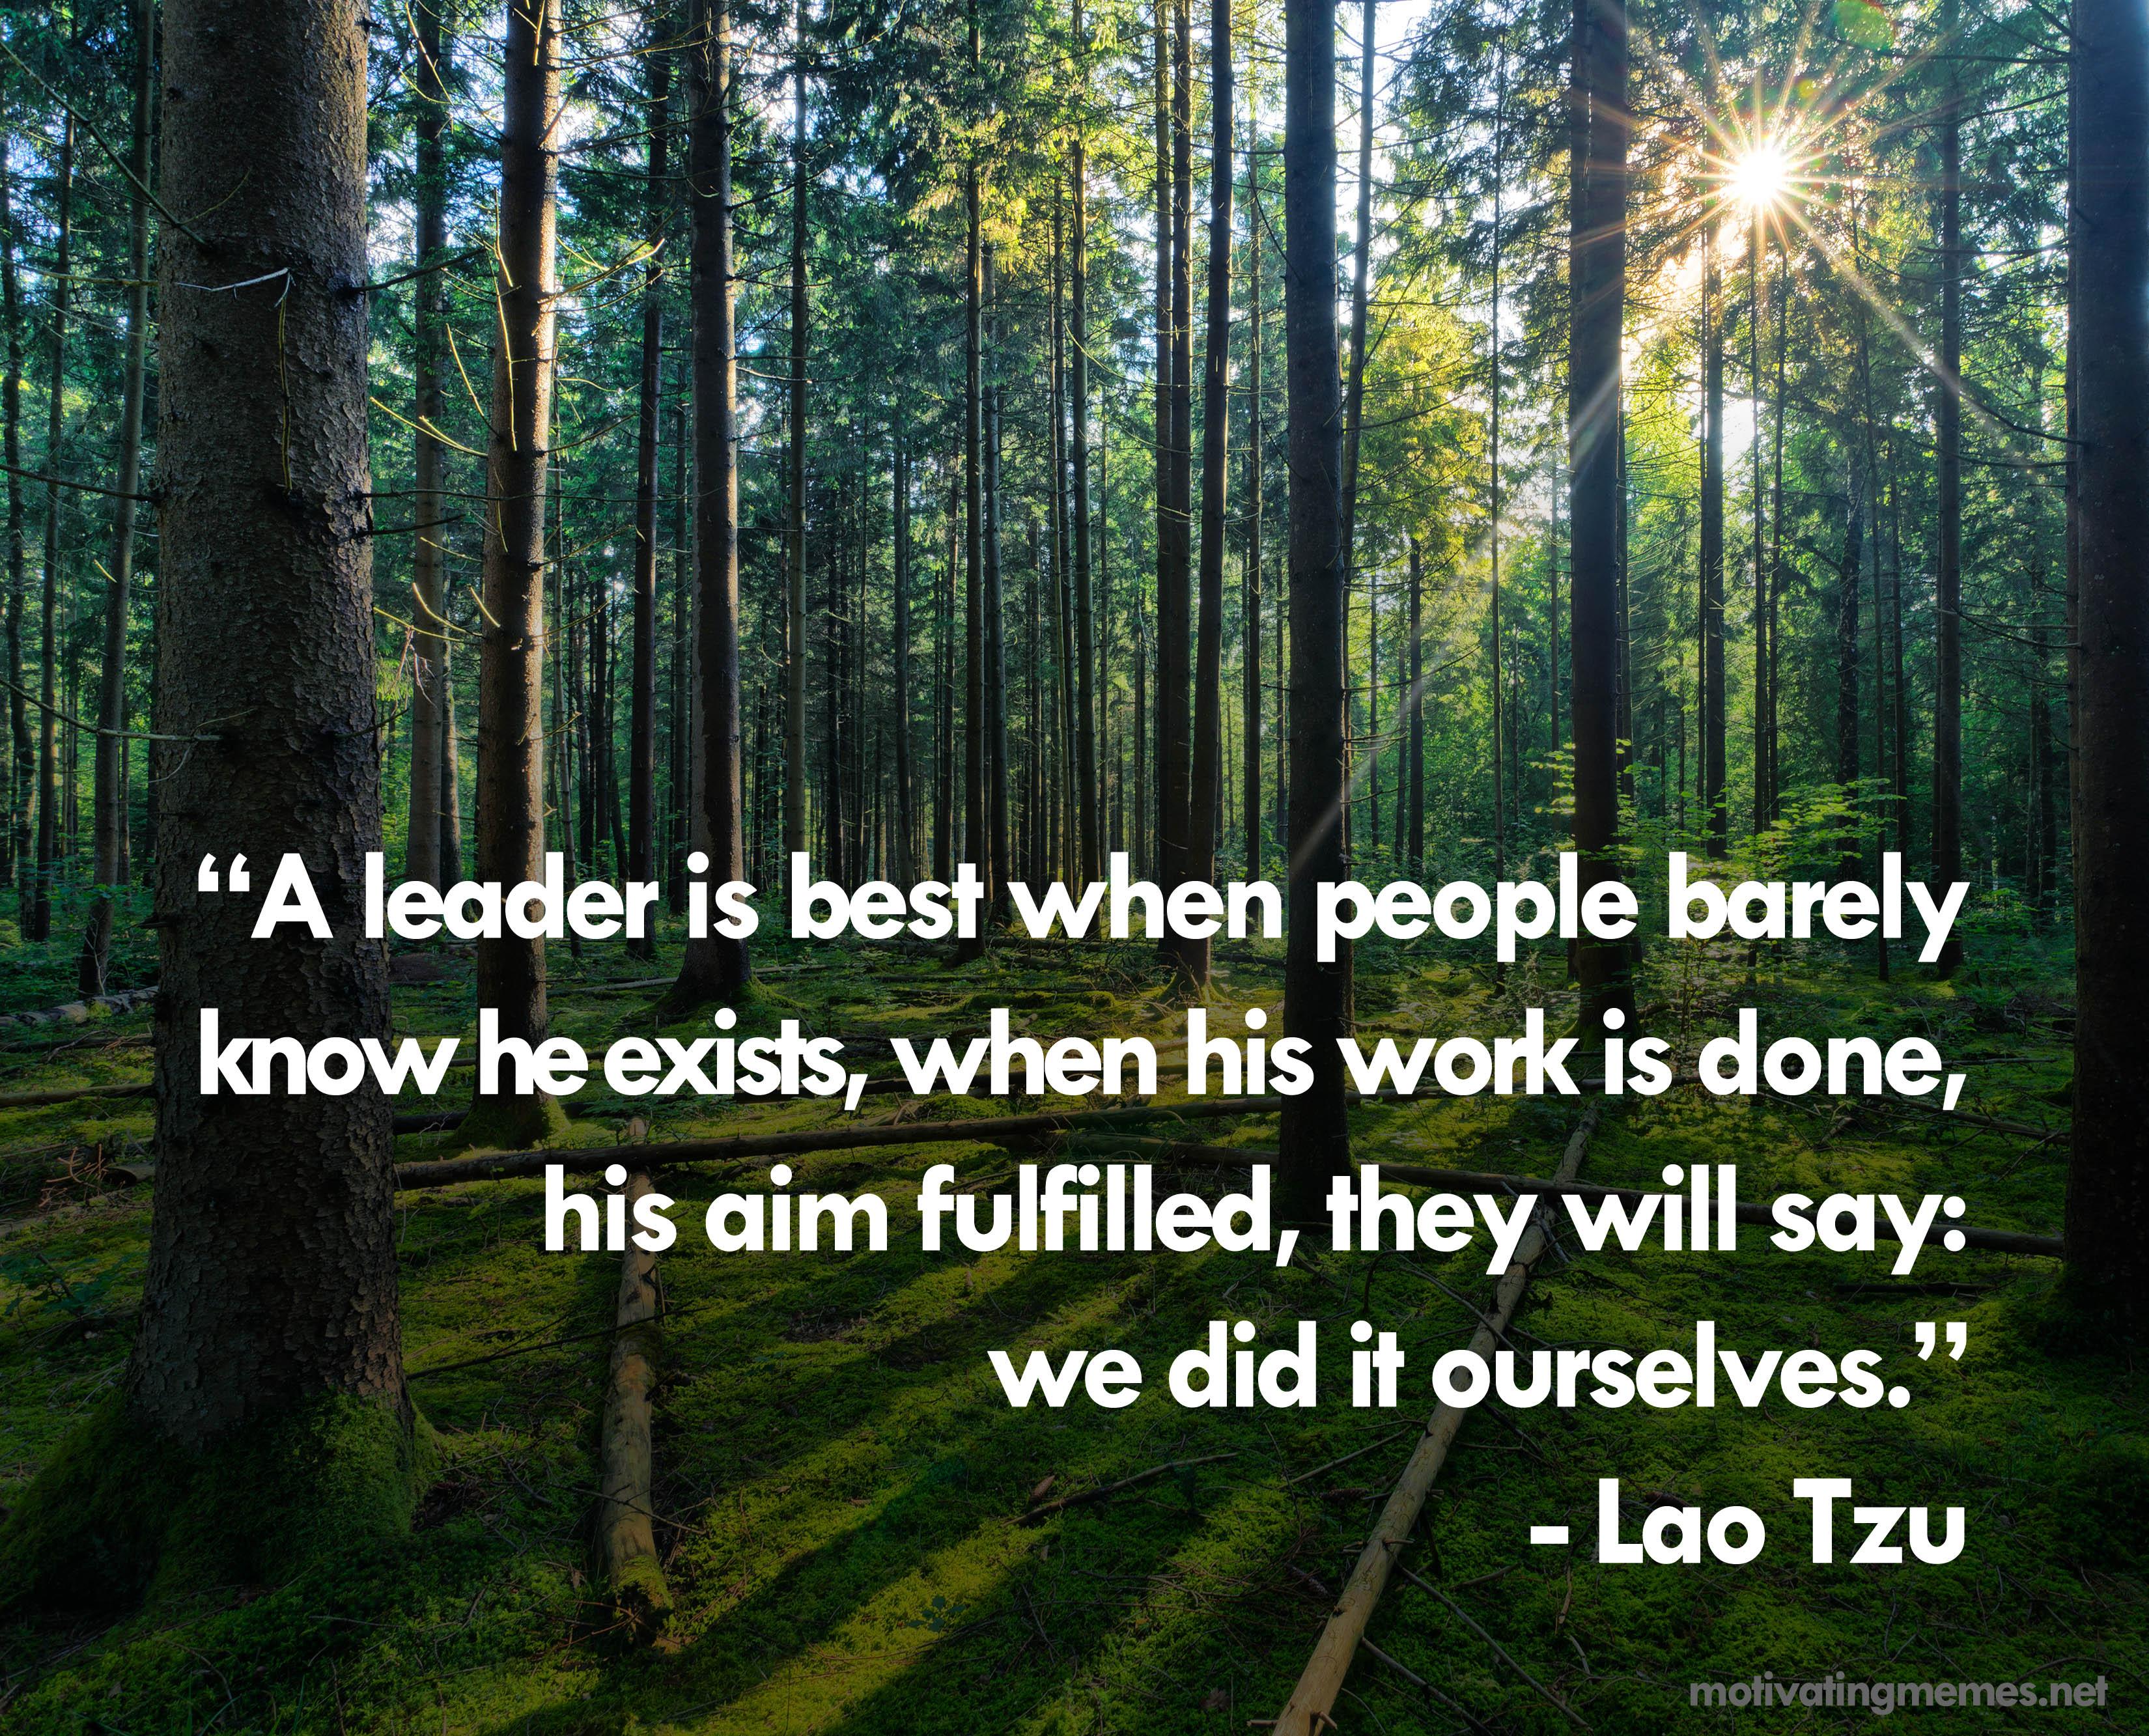 Lao Tzu Quote On Leadership